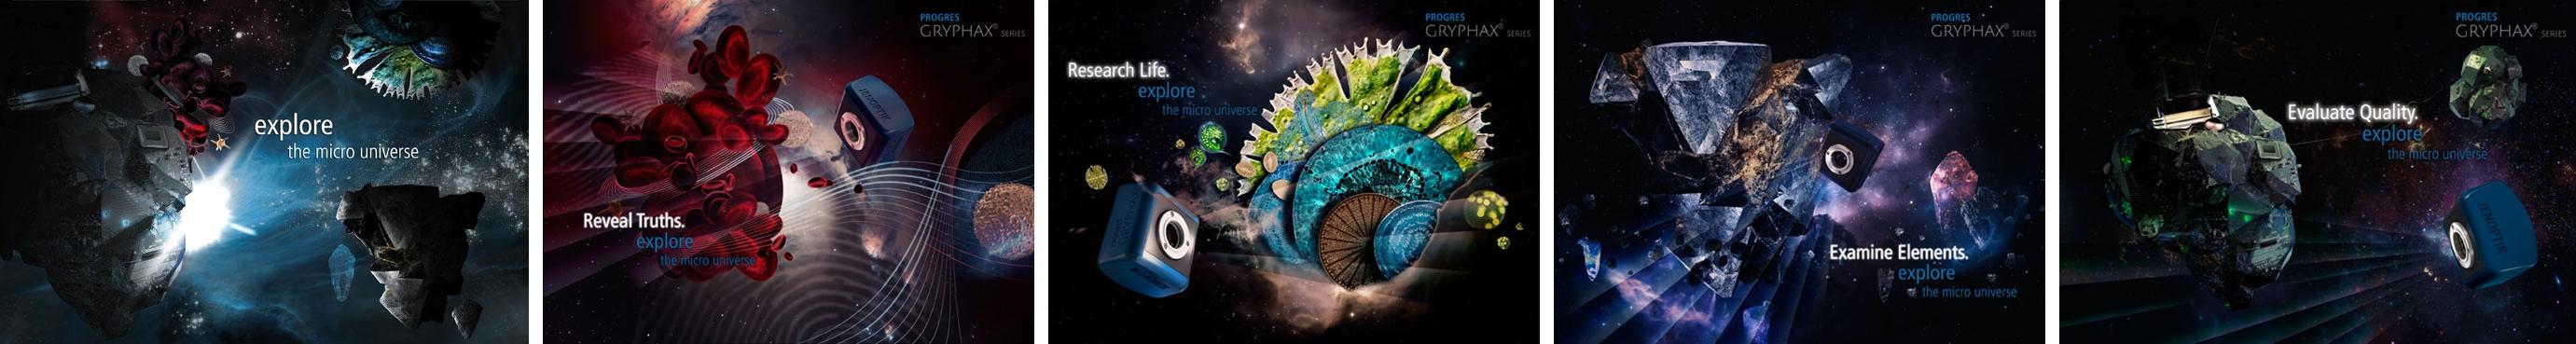 Gryphax_galaxy